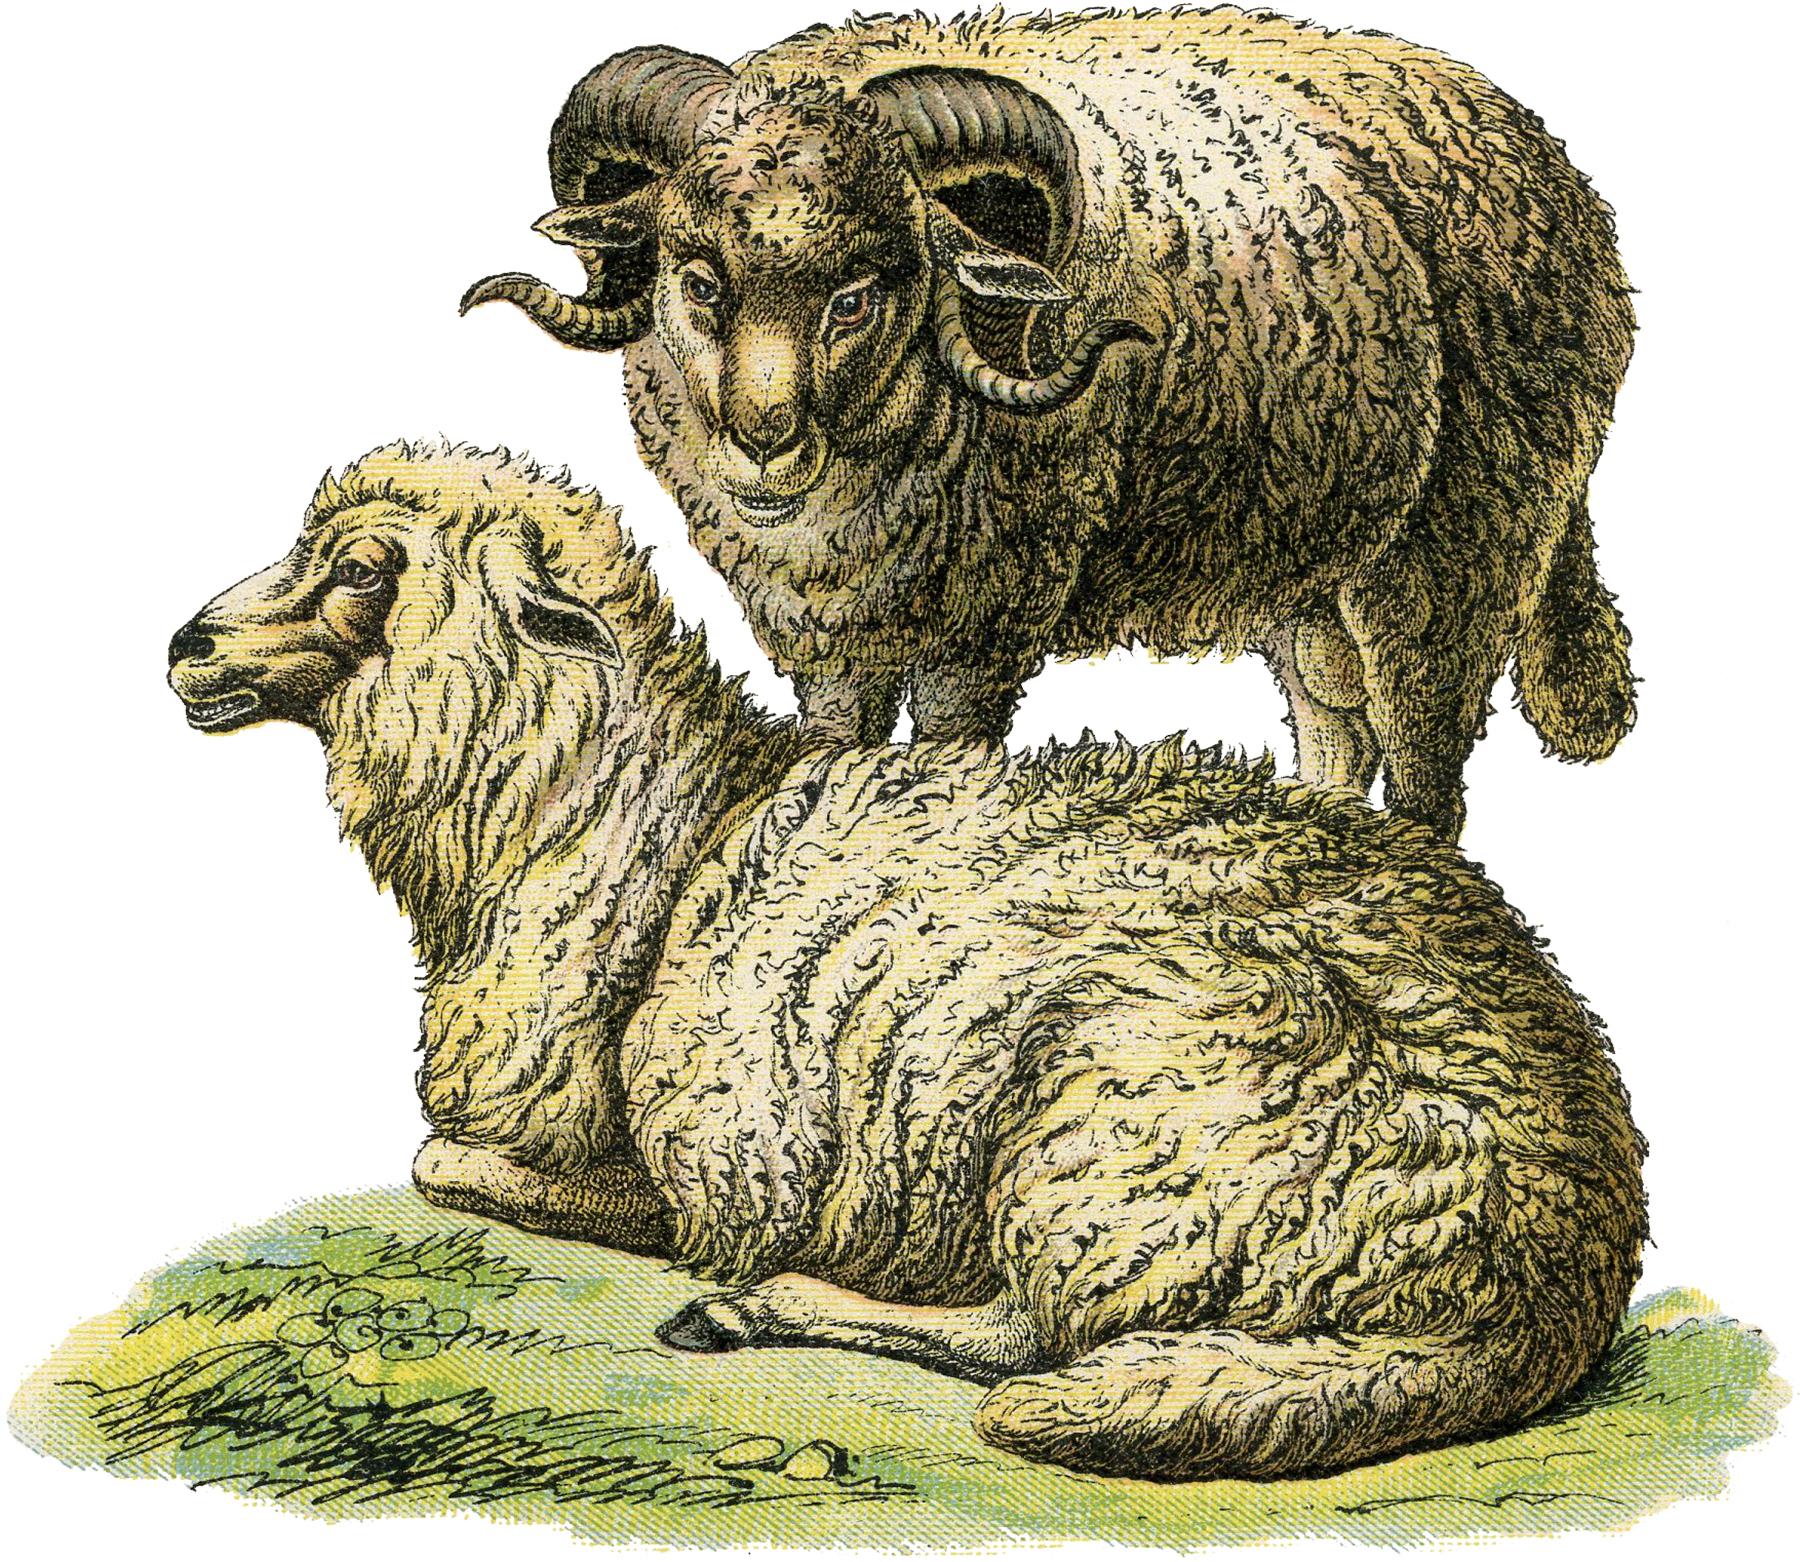 Realistic Sheep Illustration